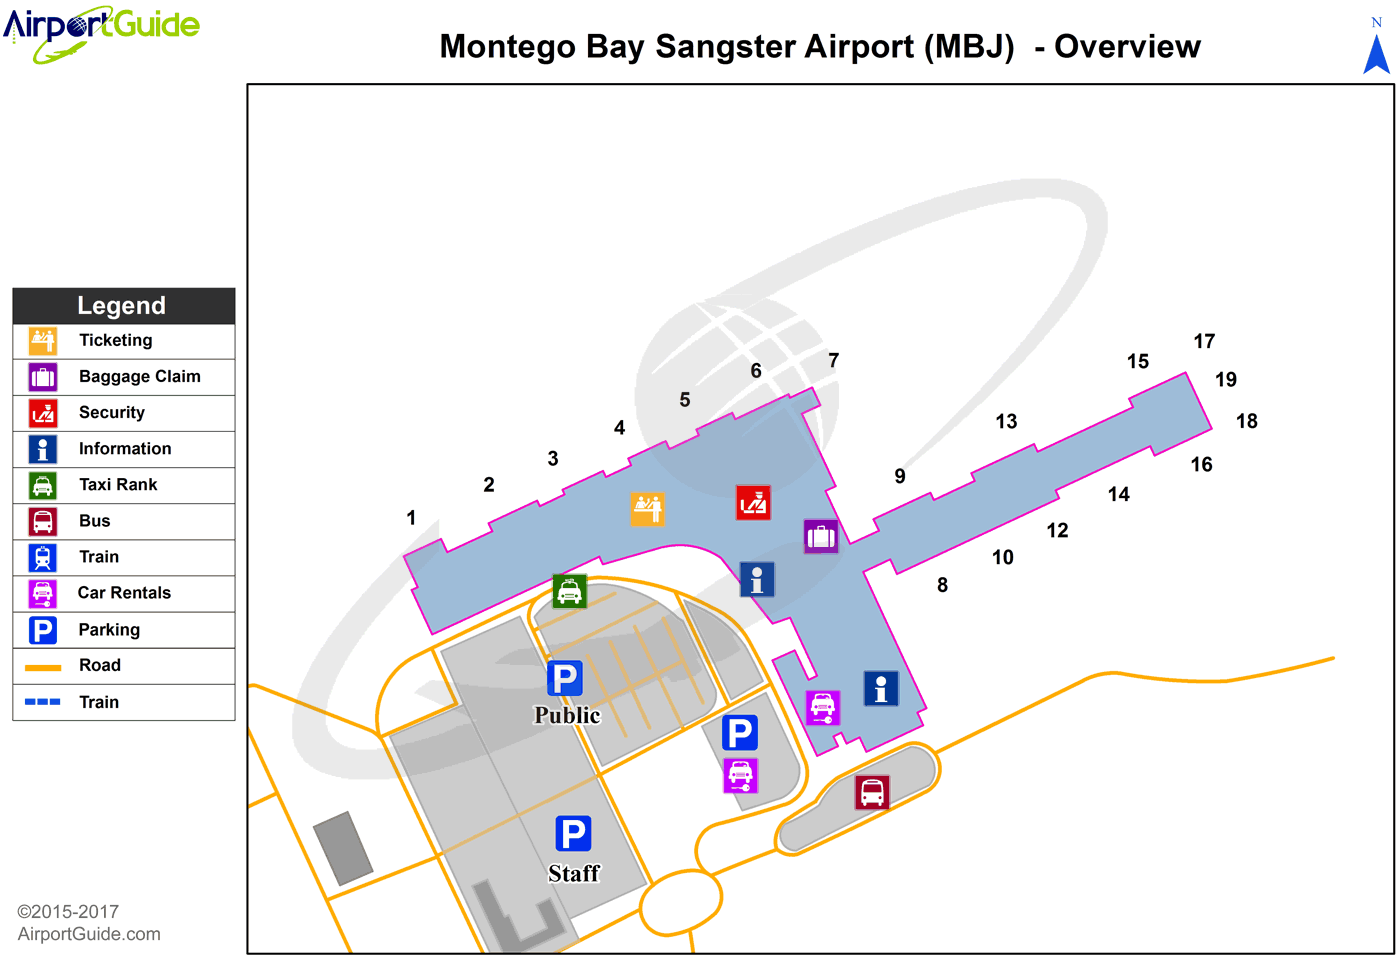 Montego Bay Sangster International (MBJ) Airport